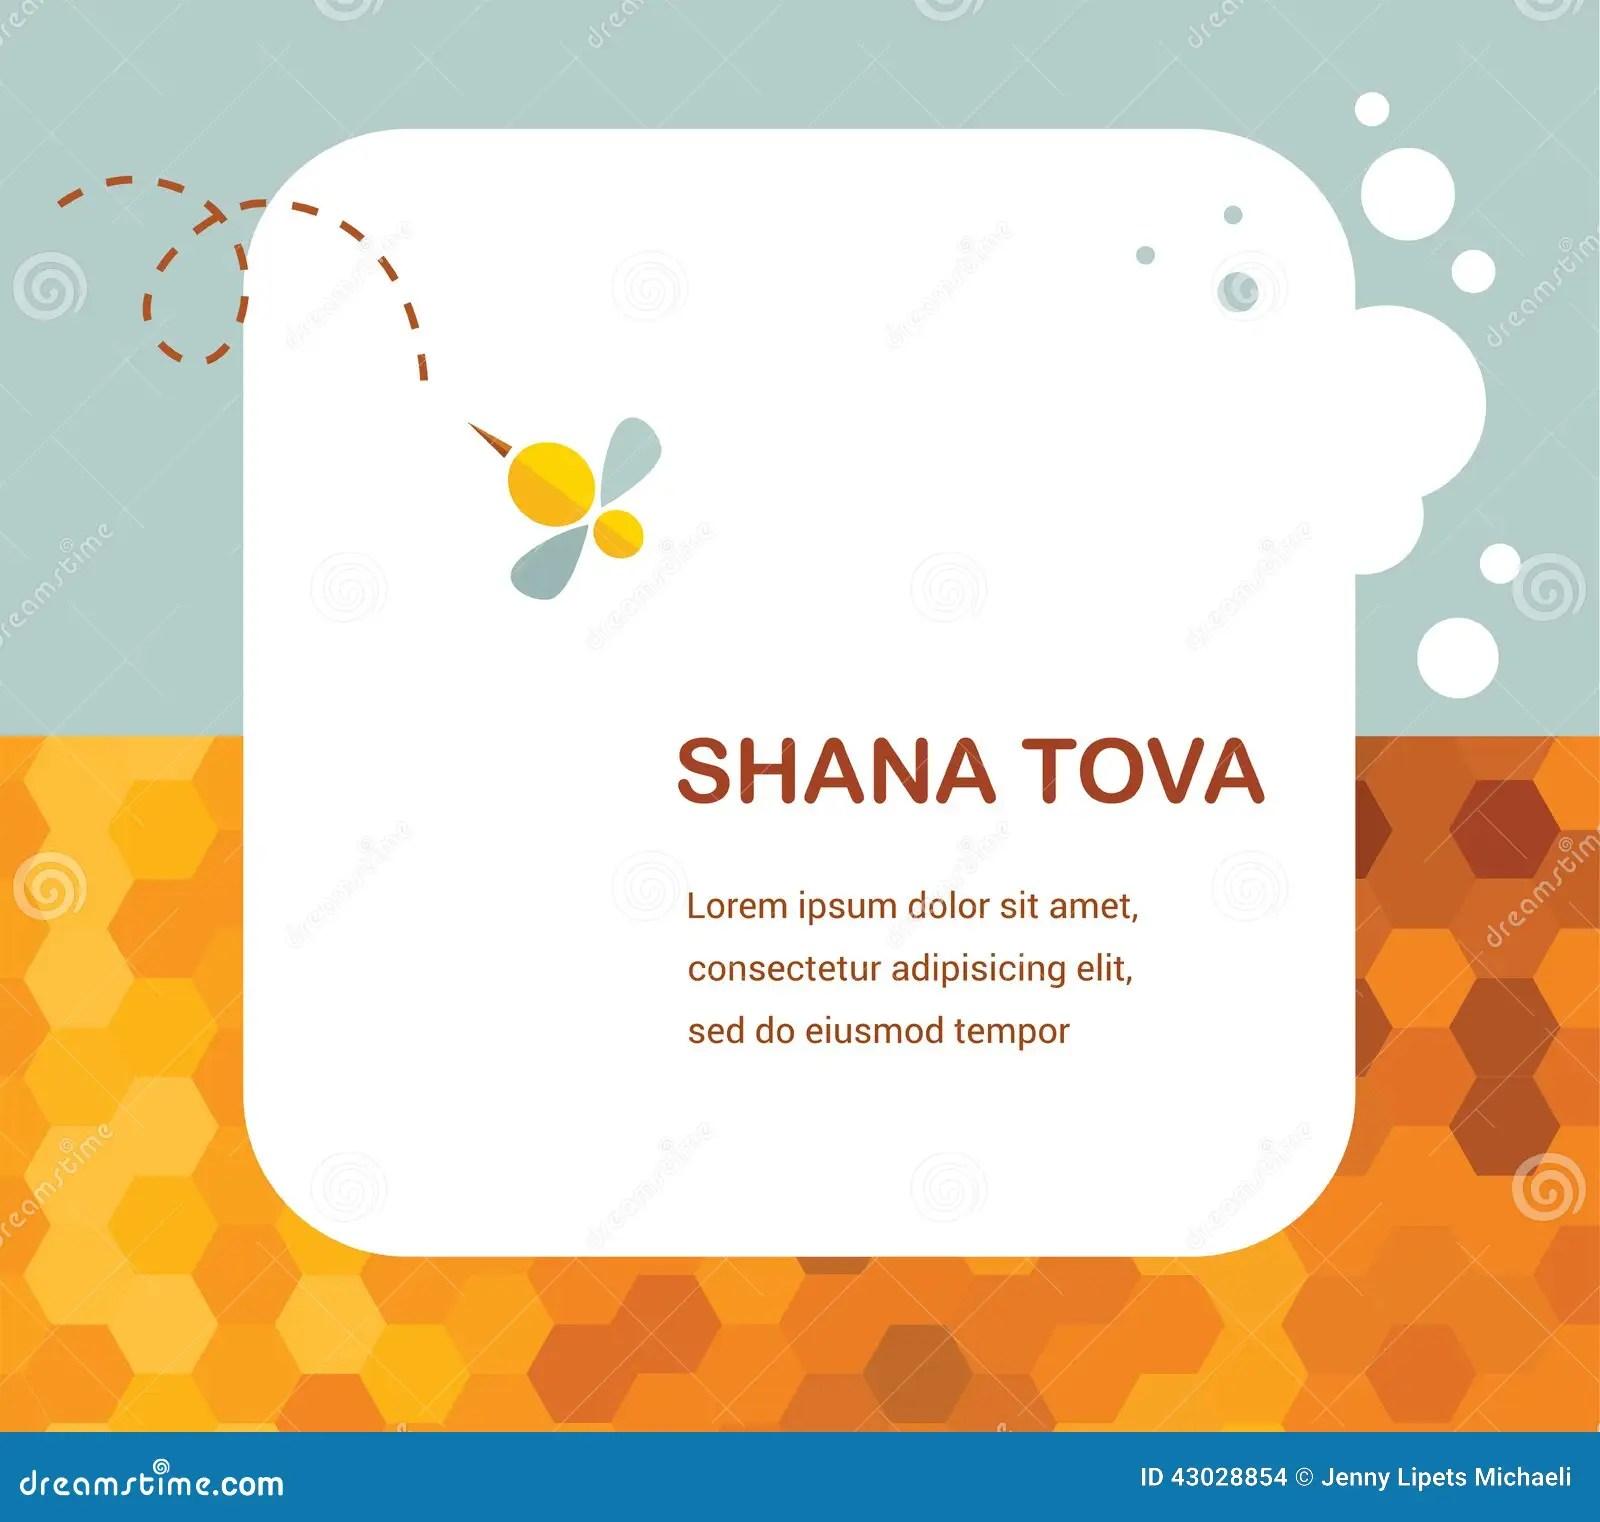 Happy New Year Hebrew Rosh Hashana Greeting Card With Leaking Honey Stock Illustration